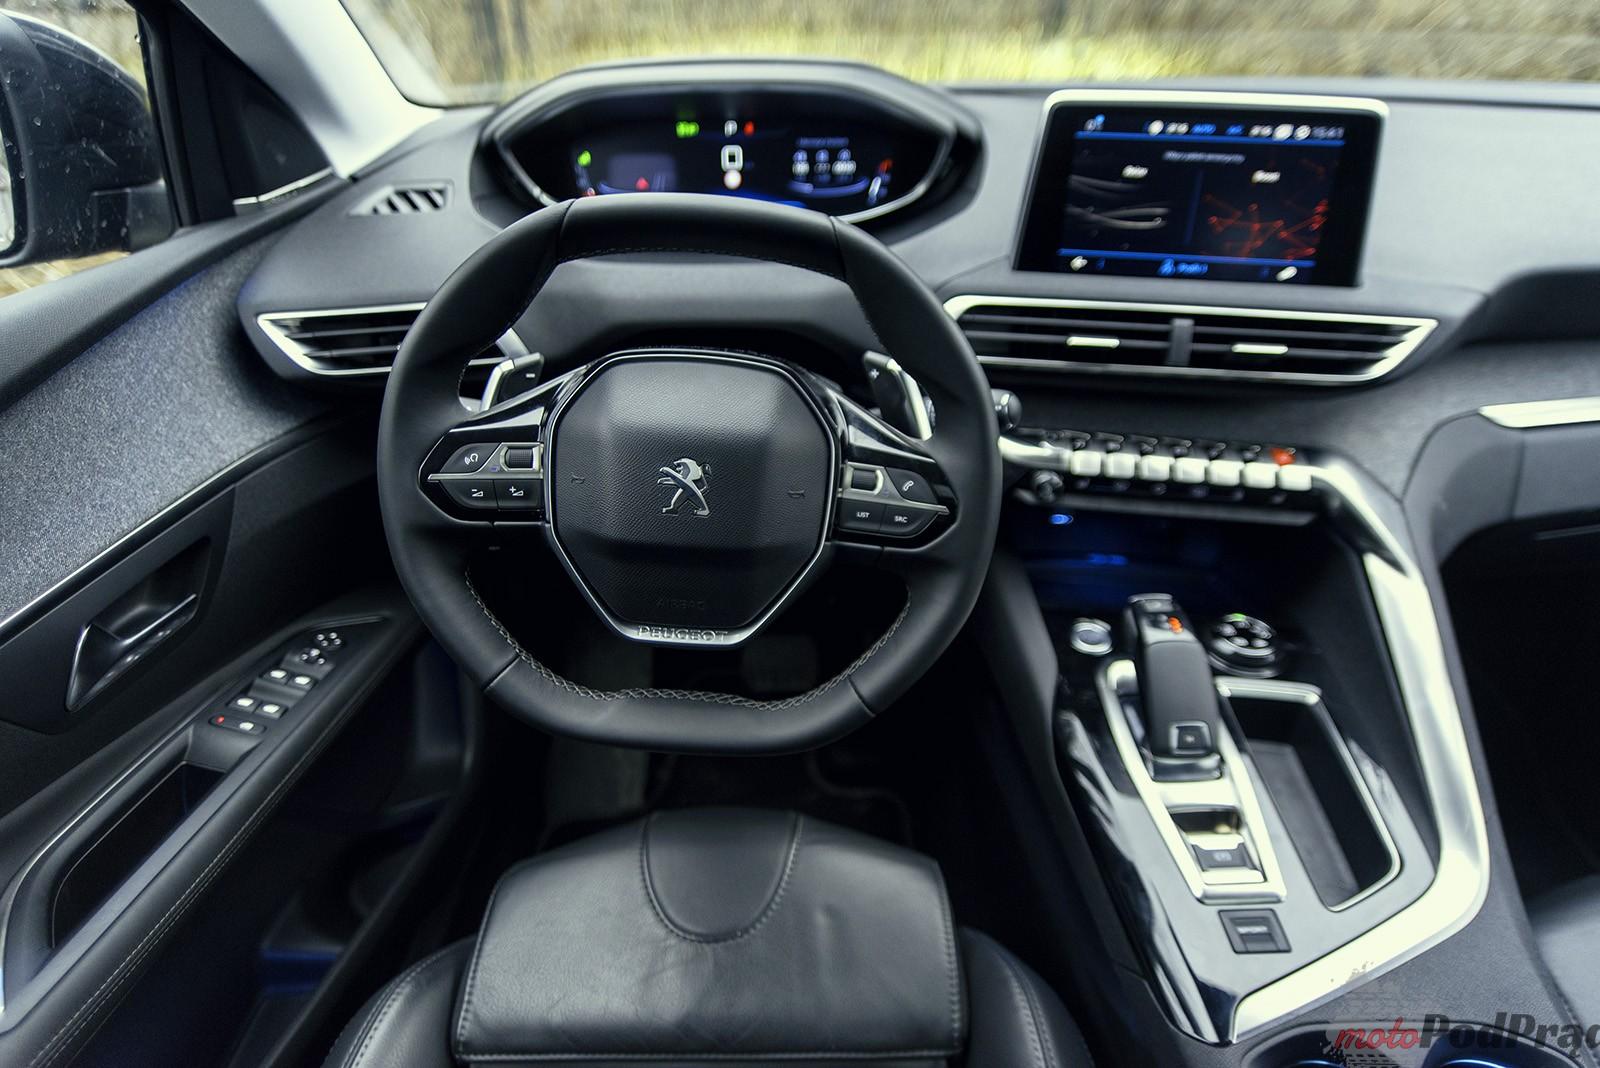 Peugeot 3008 22 Test: Peugeot 3008 1.6 THP   wirtualny lew